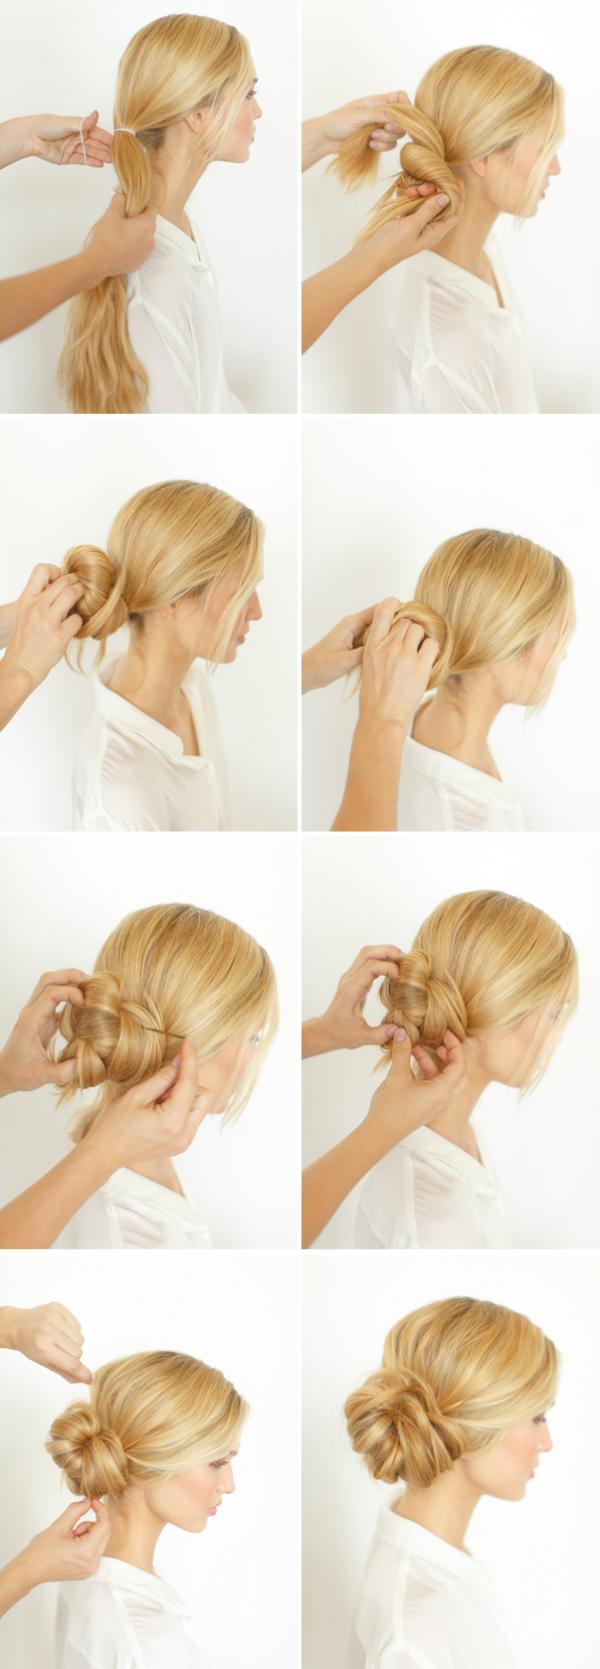 diy-low-bun-hair-tutorial-bryce-covey-amy-clarke-600x1669